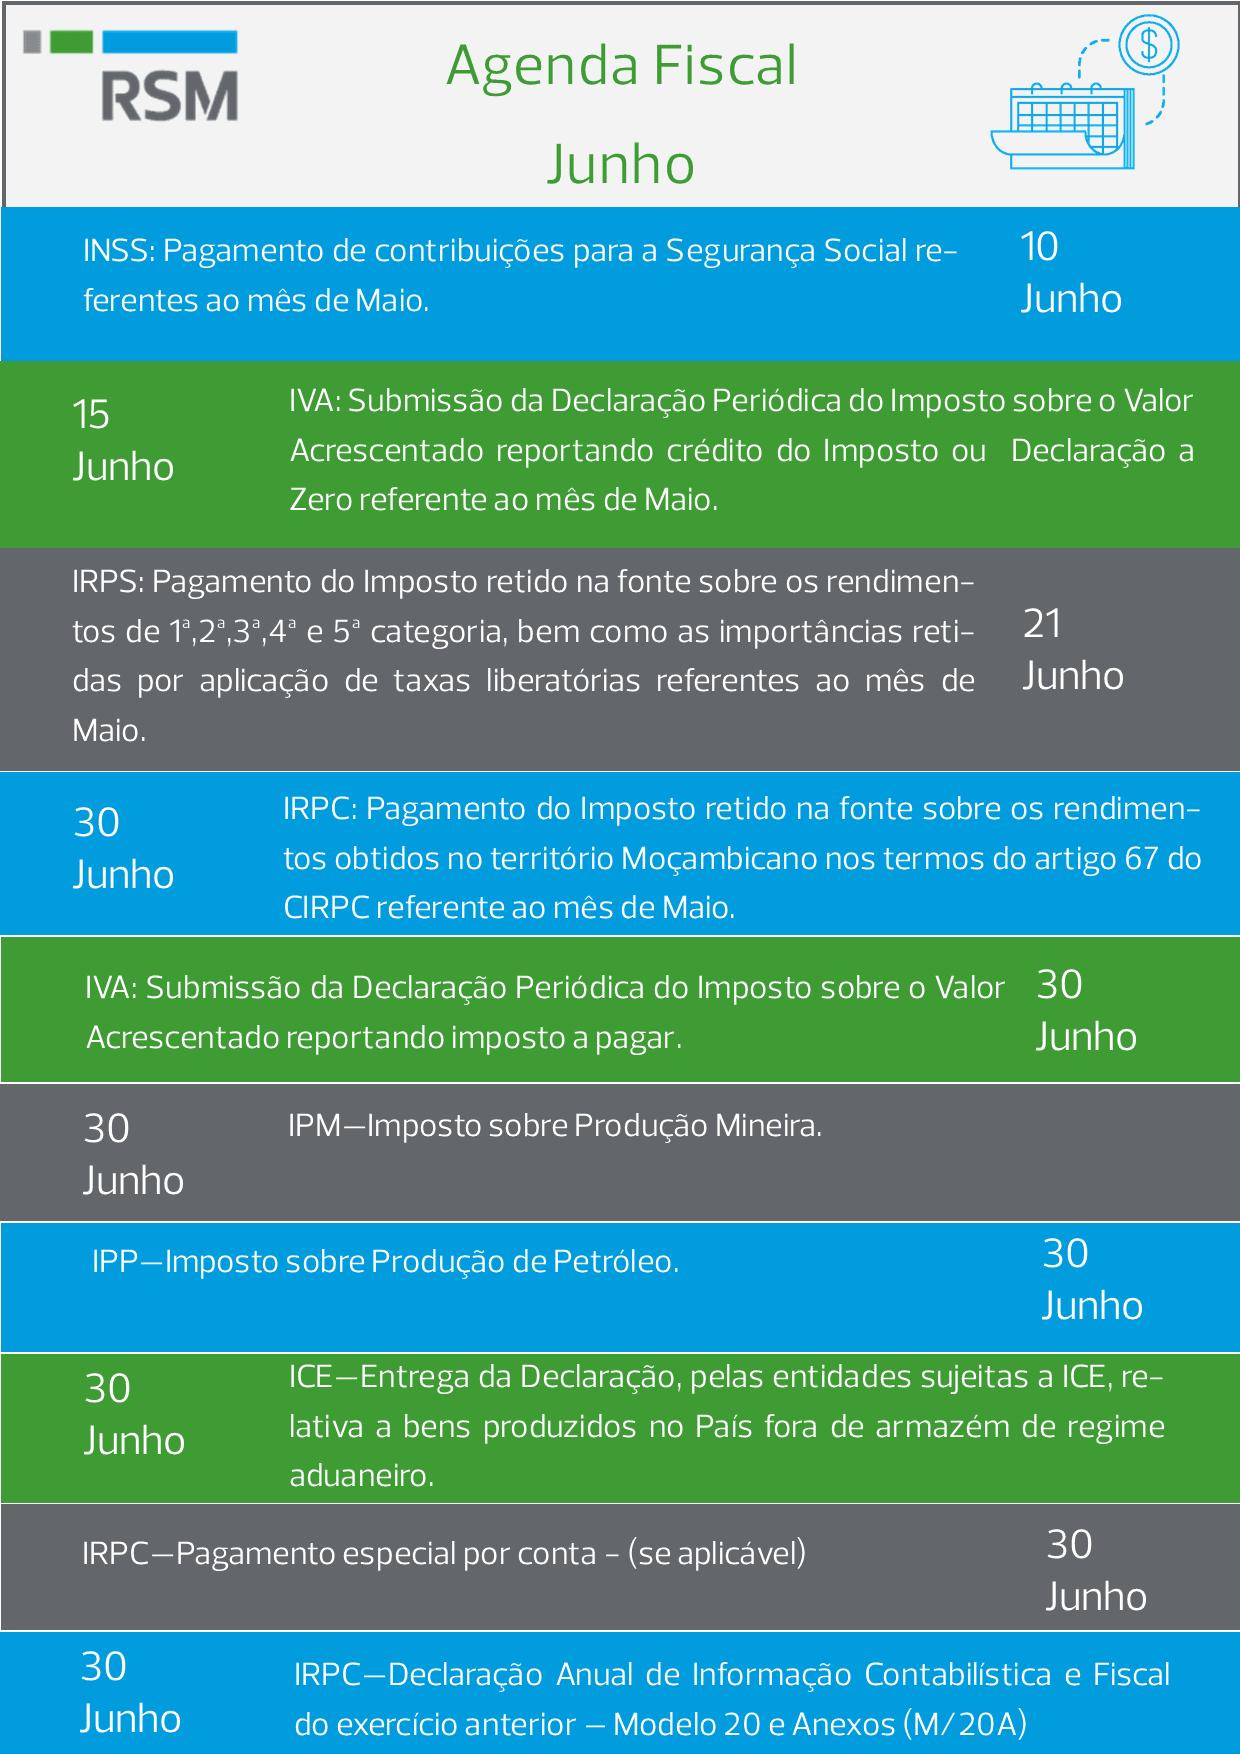 agenda_fiscal_de_junho21.png